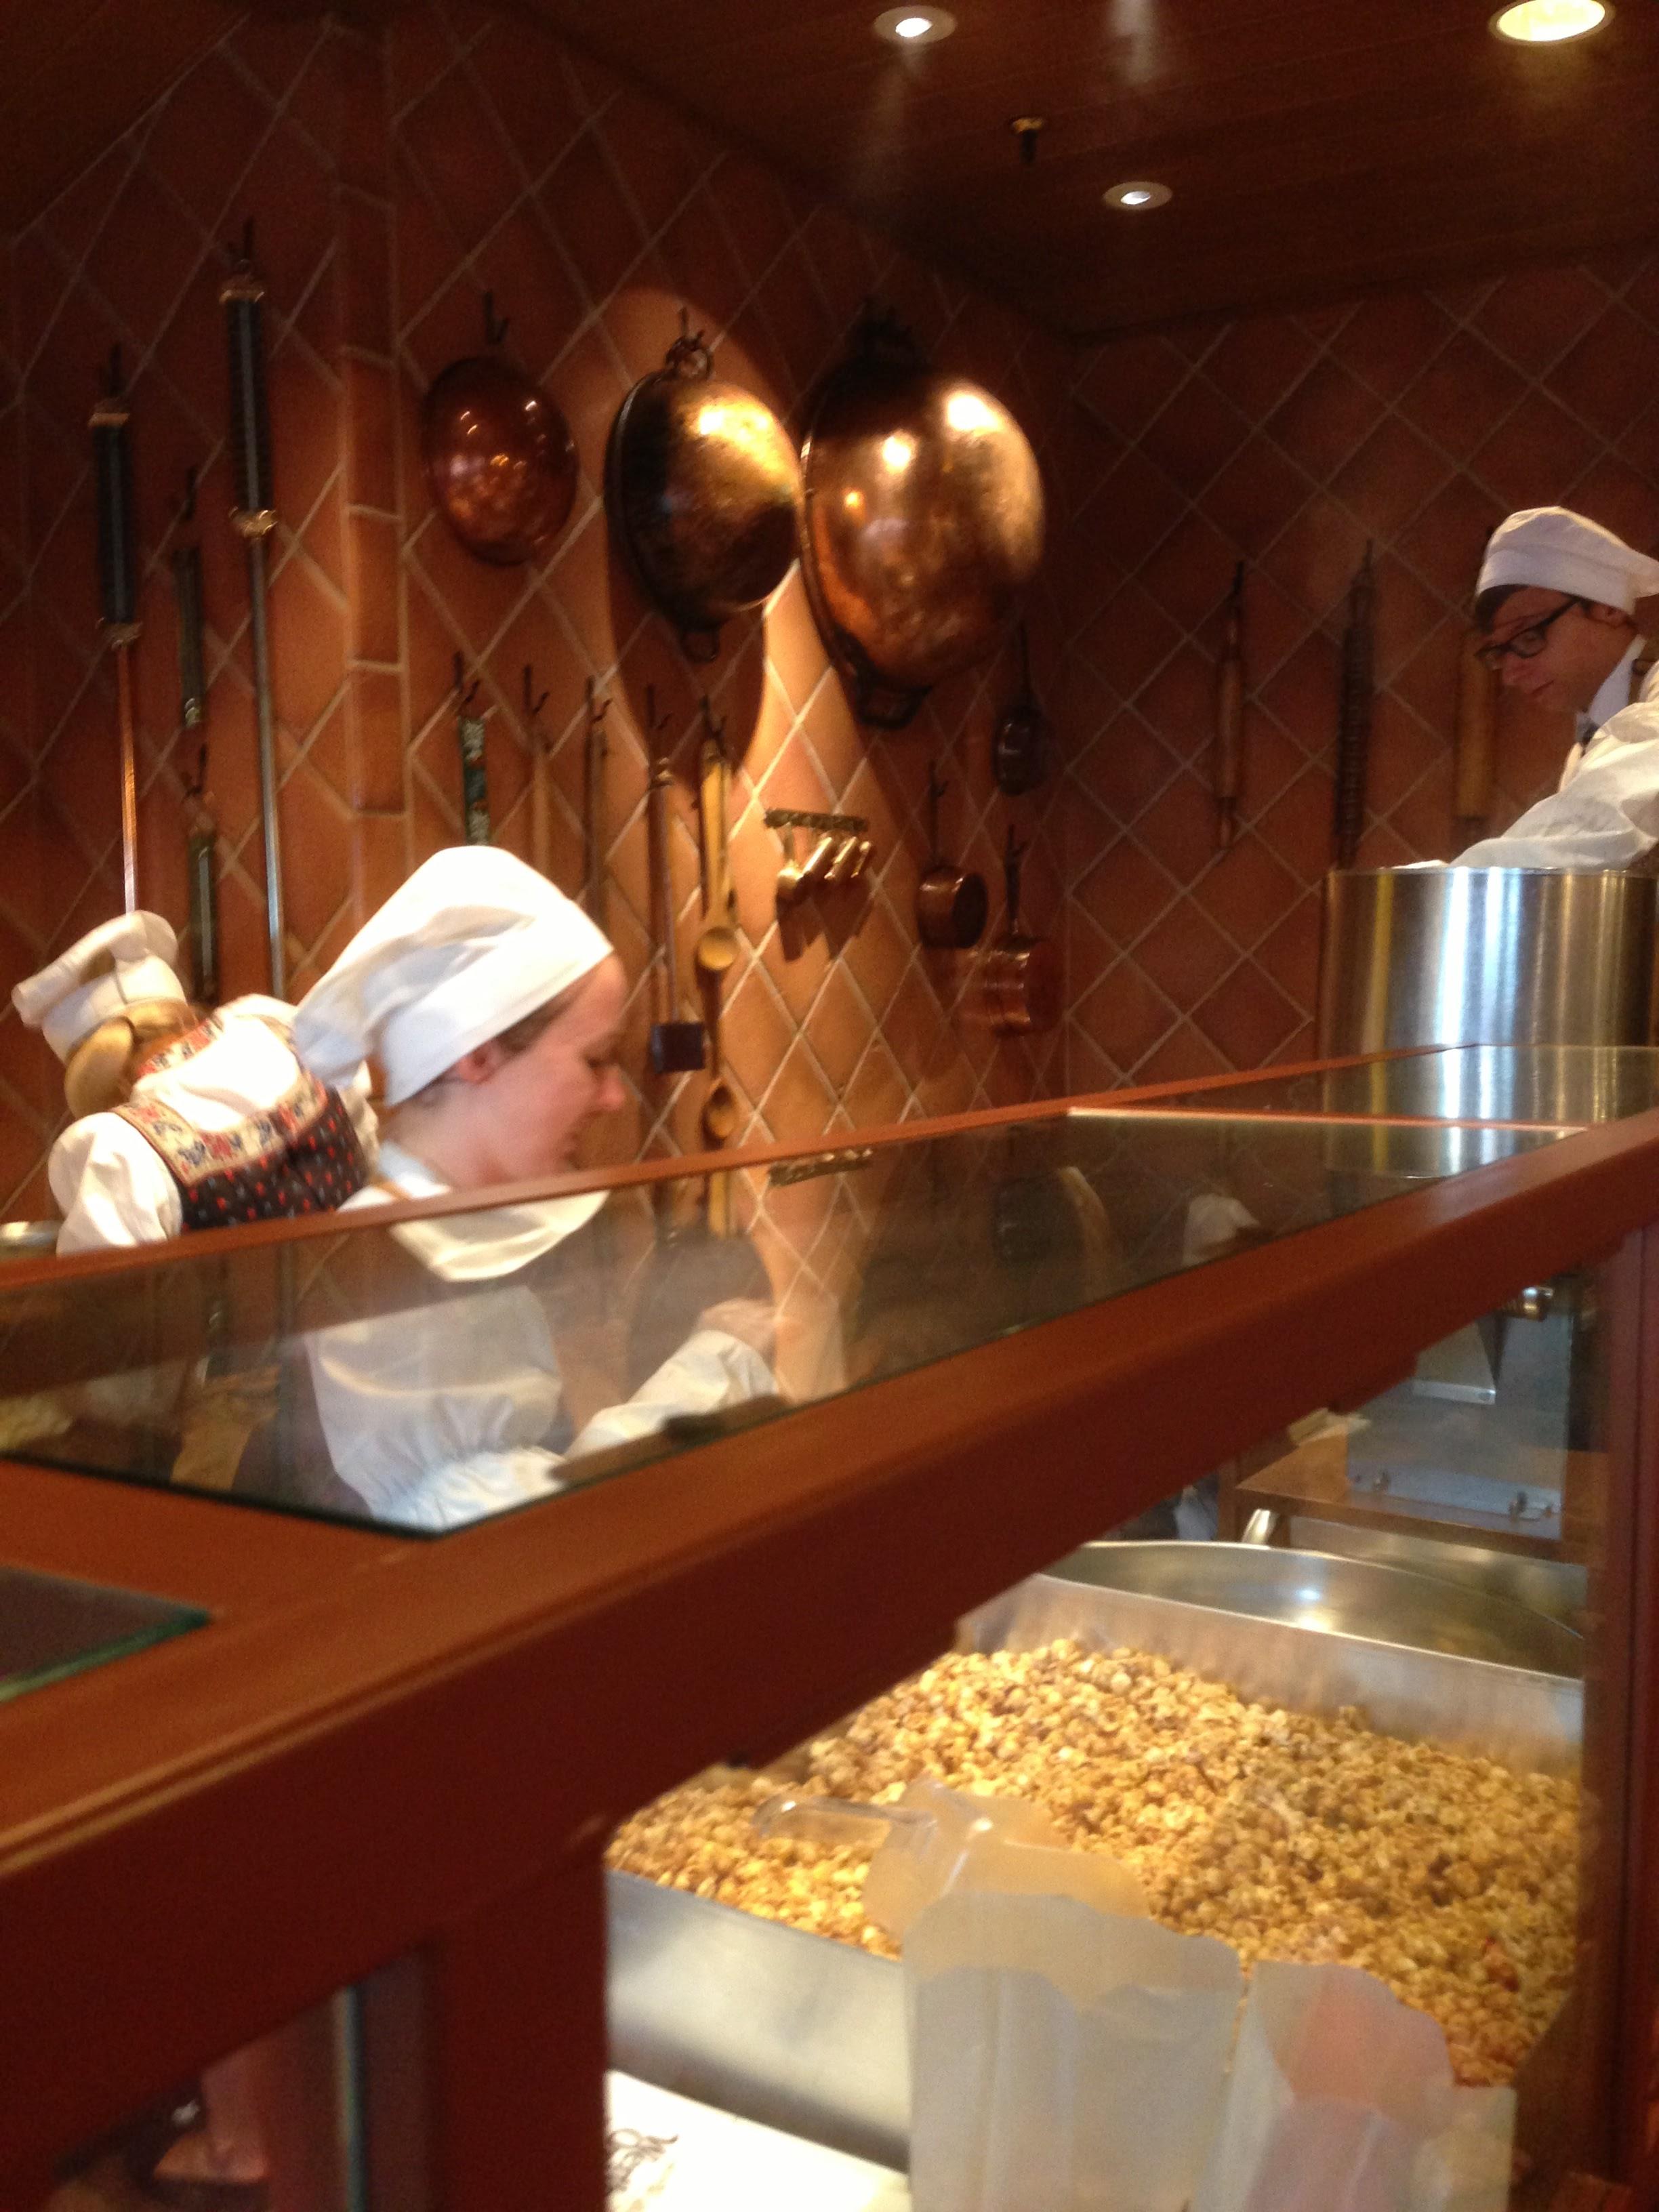 Karamell Kuche Germany Pavillion Epcot Walt Disney World Orlando